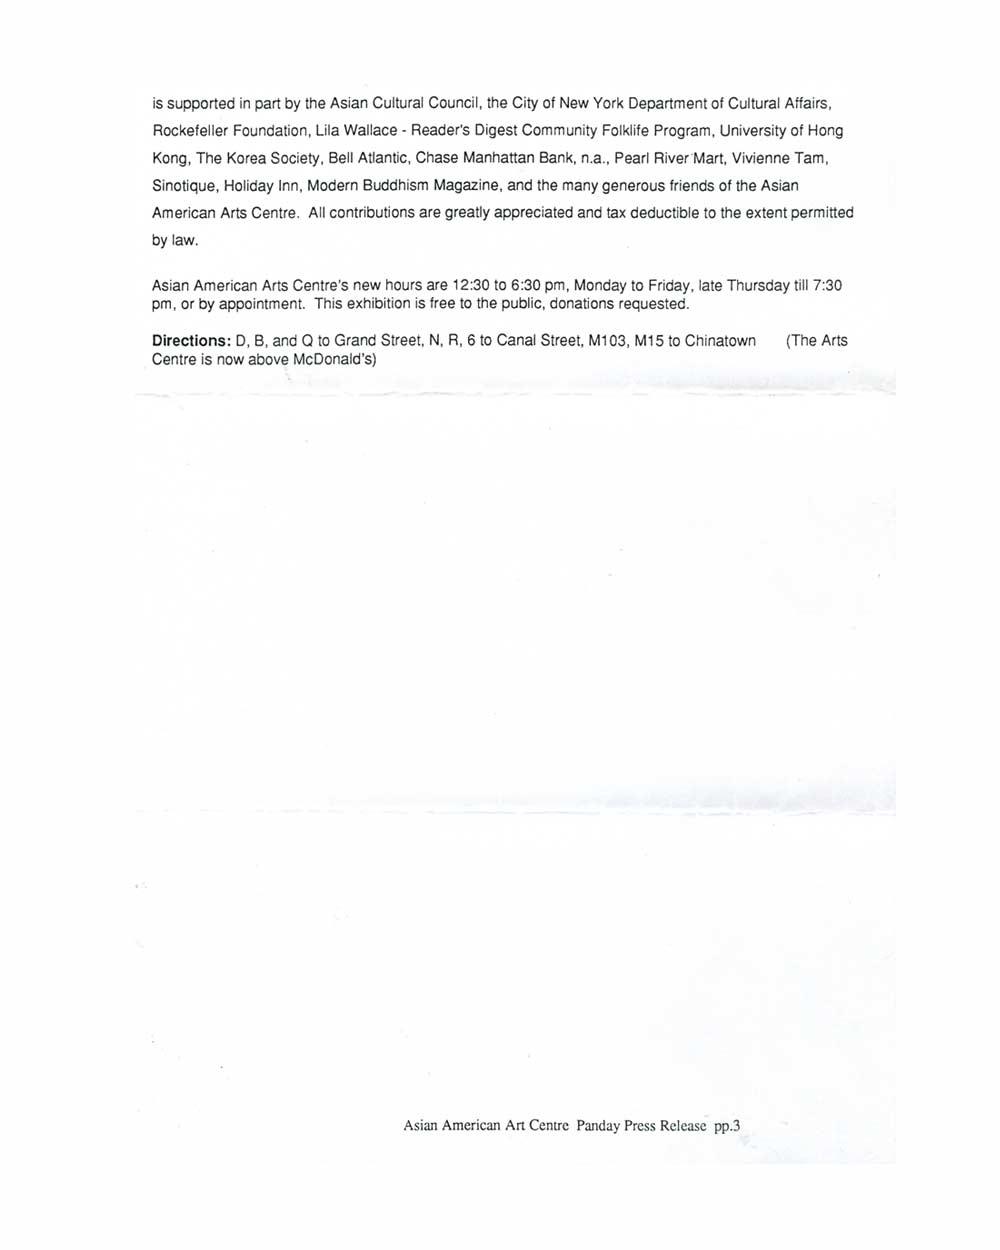 Power Print, press release, pg 3